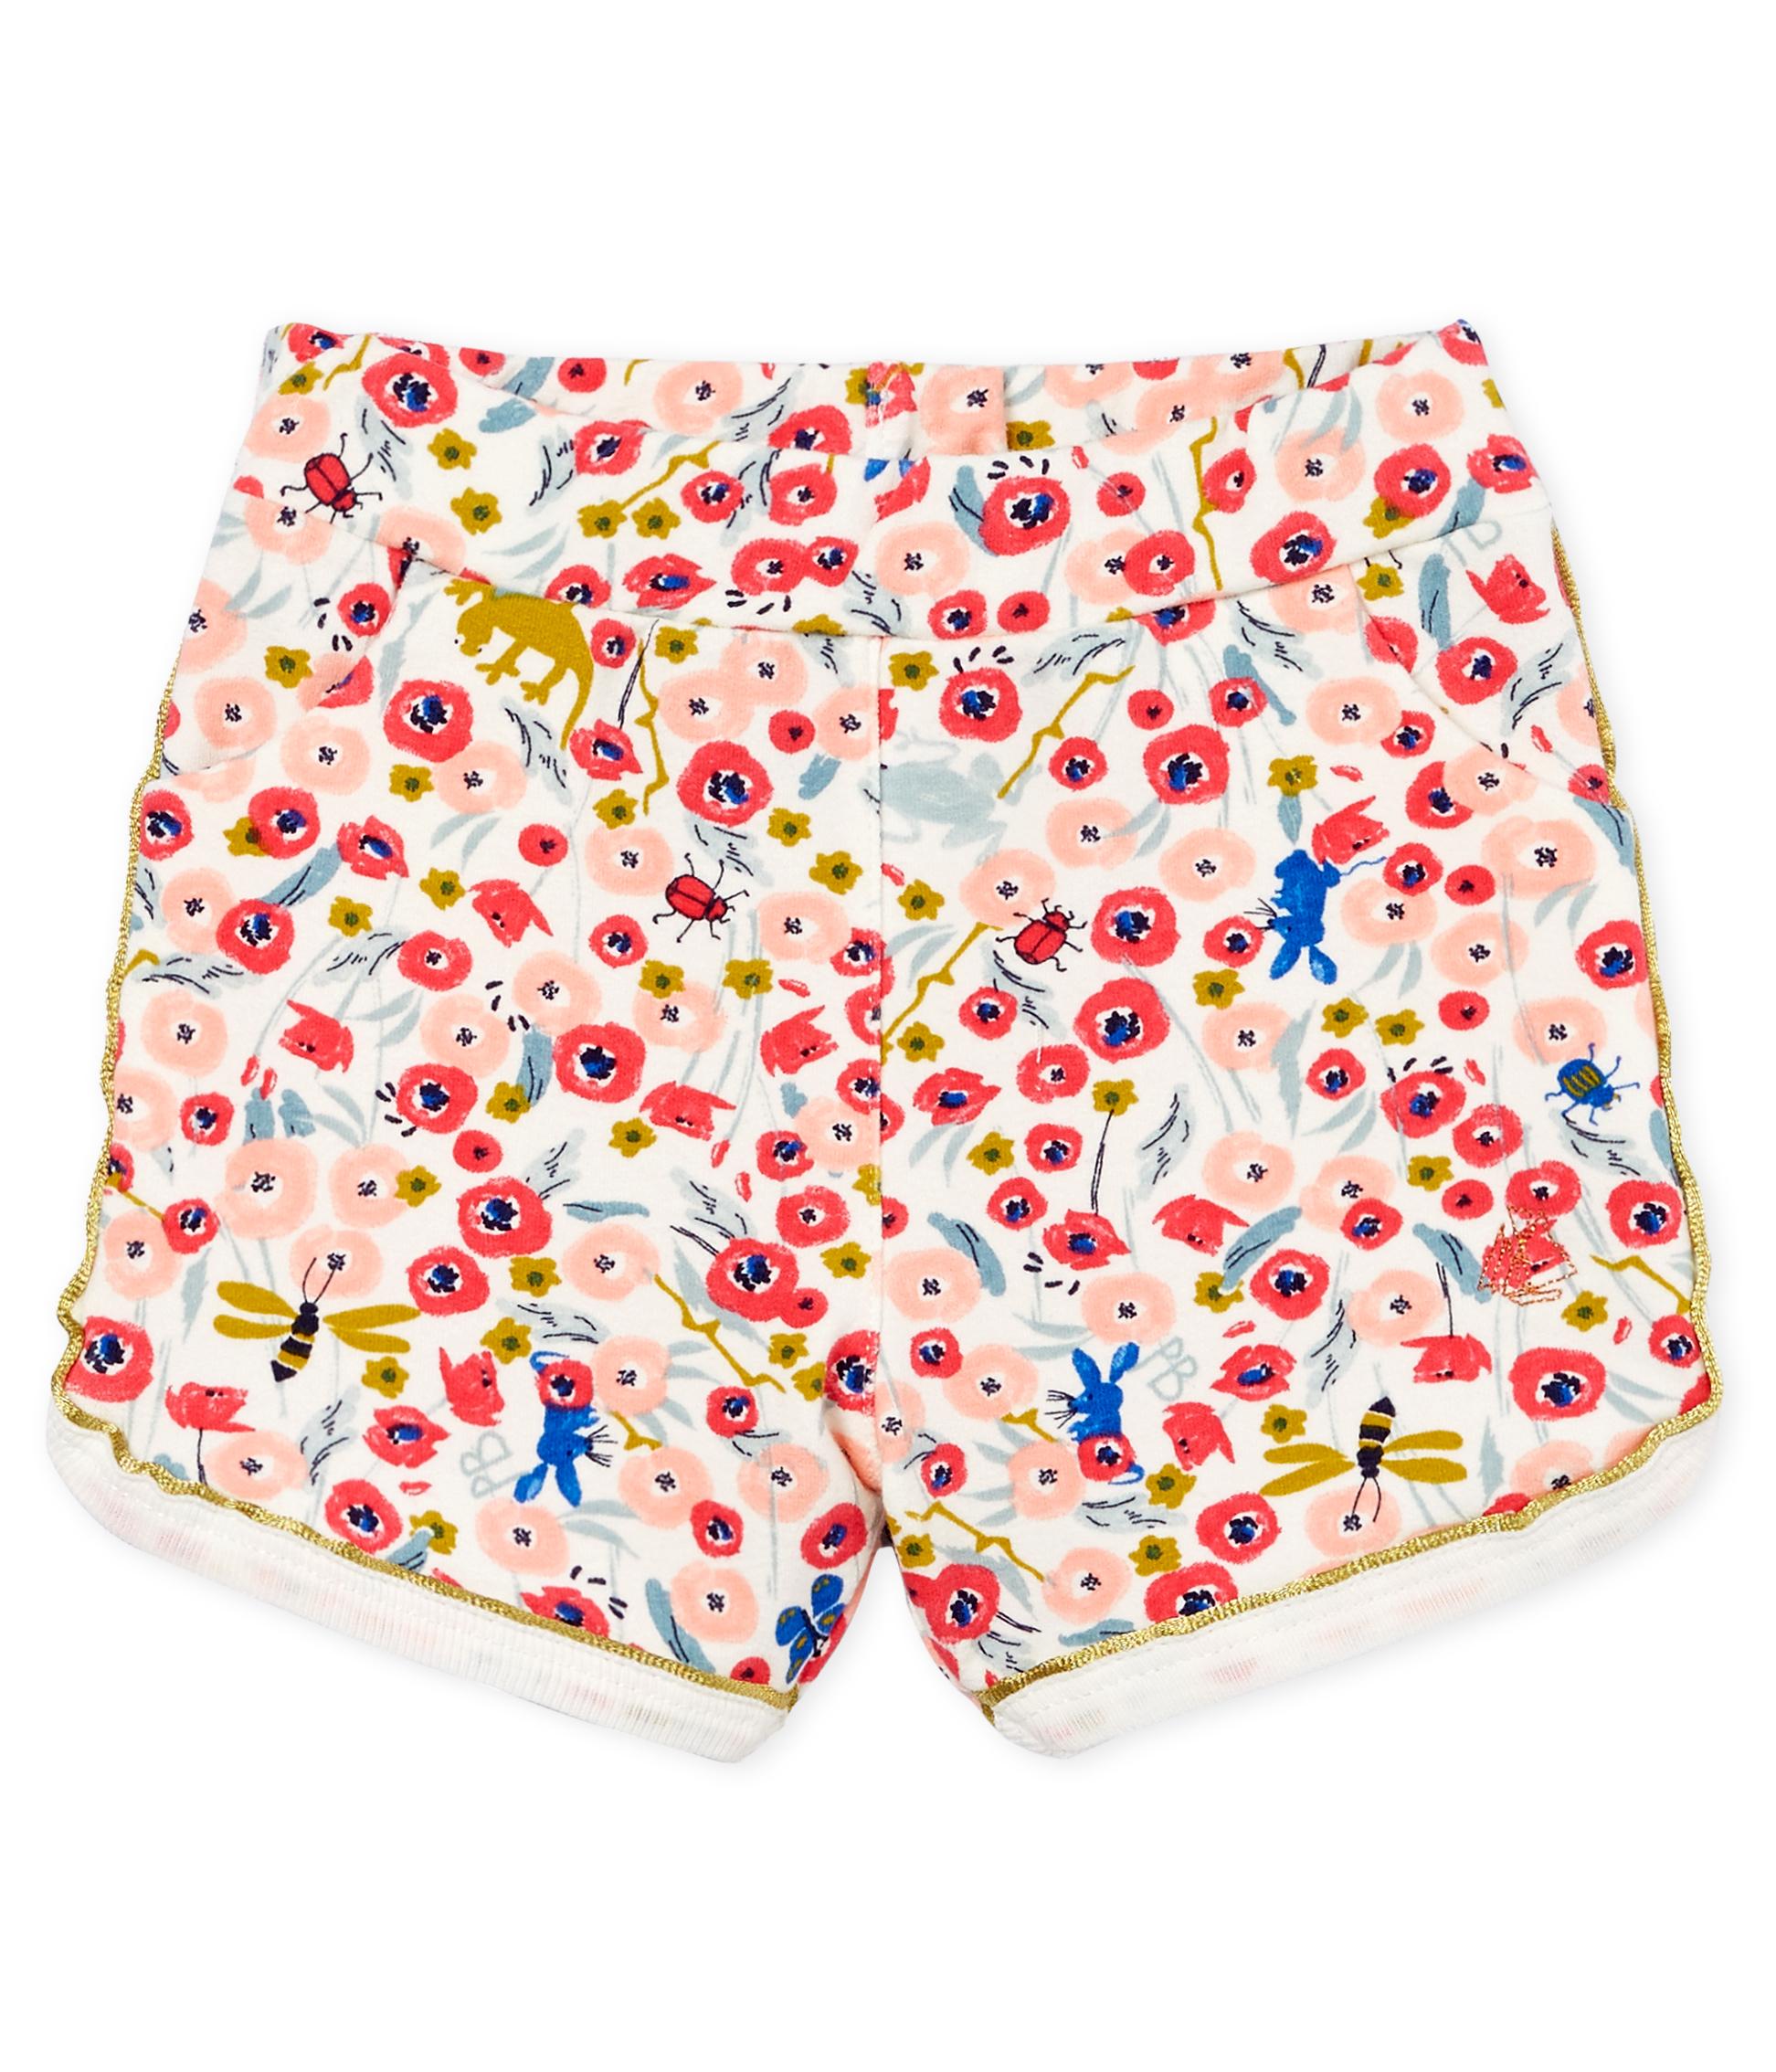 119613a37f Petit Bateau Baby Boys Printed Swim Shorts 6 Months Clothing Trunks